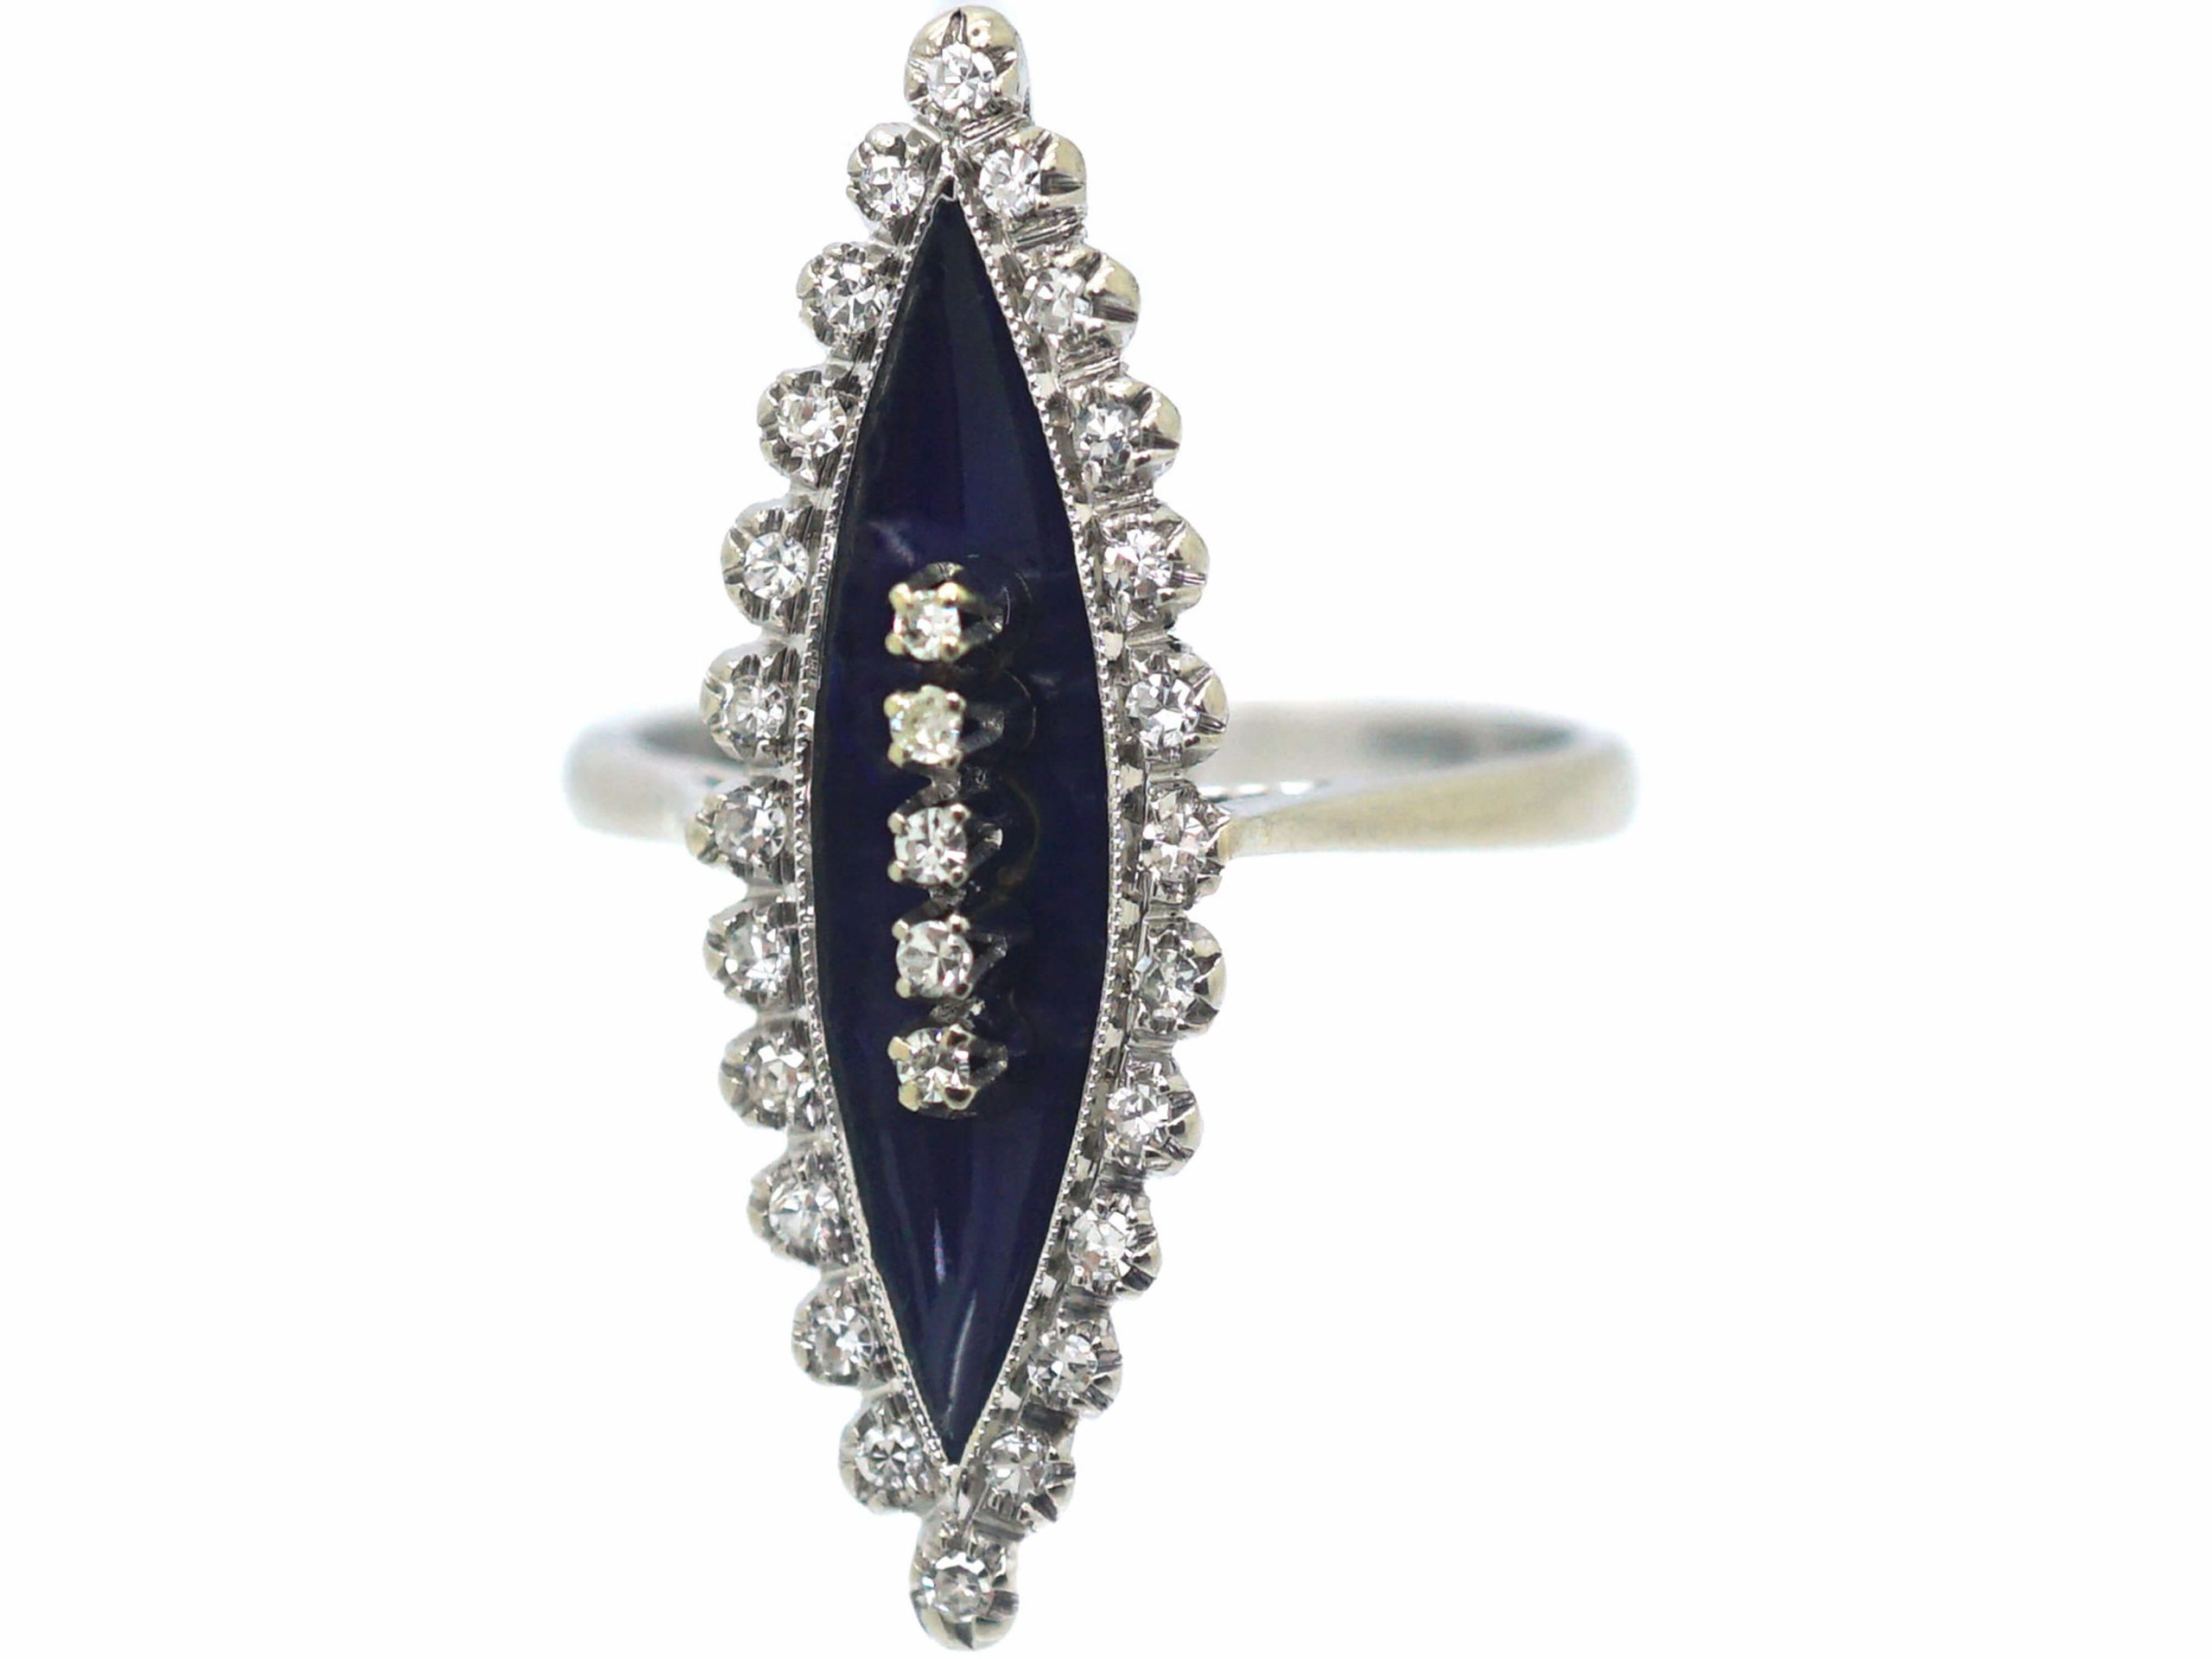 18ct White Gold, Blue Enamel & Diamond Marquise Ring